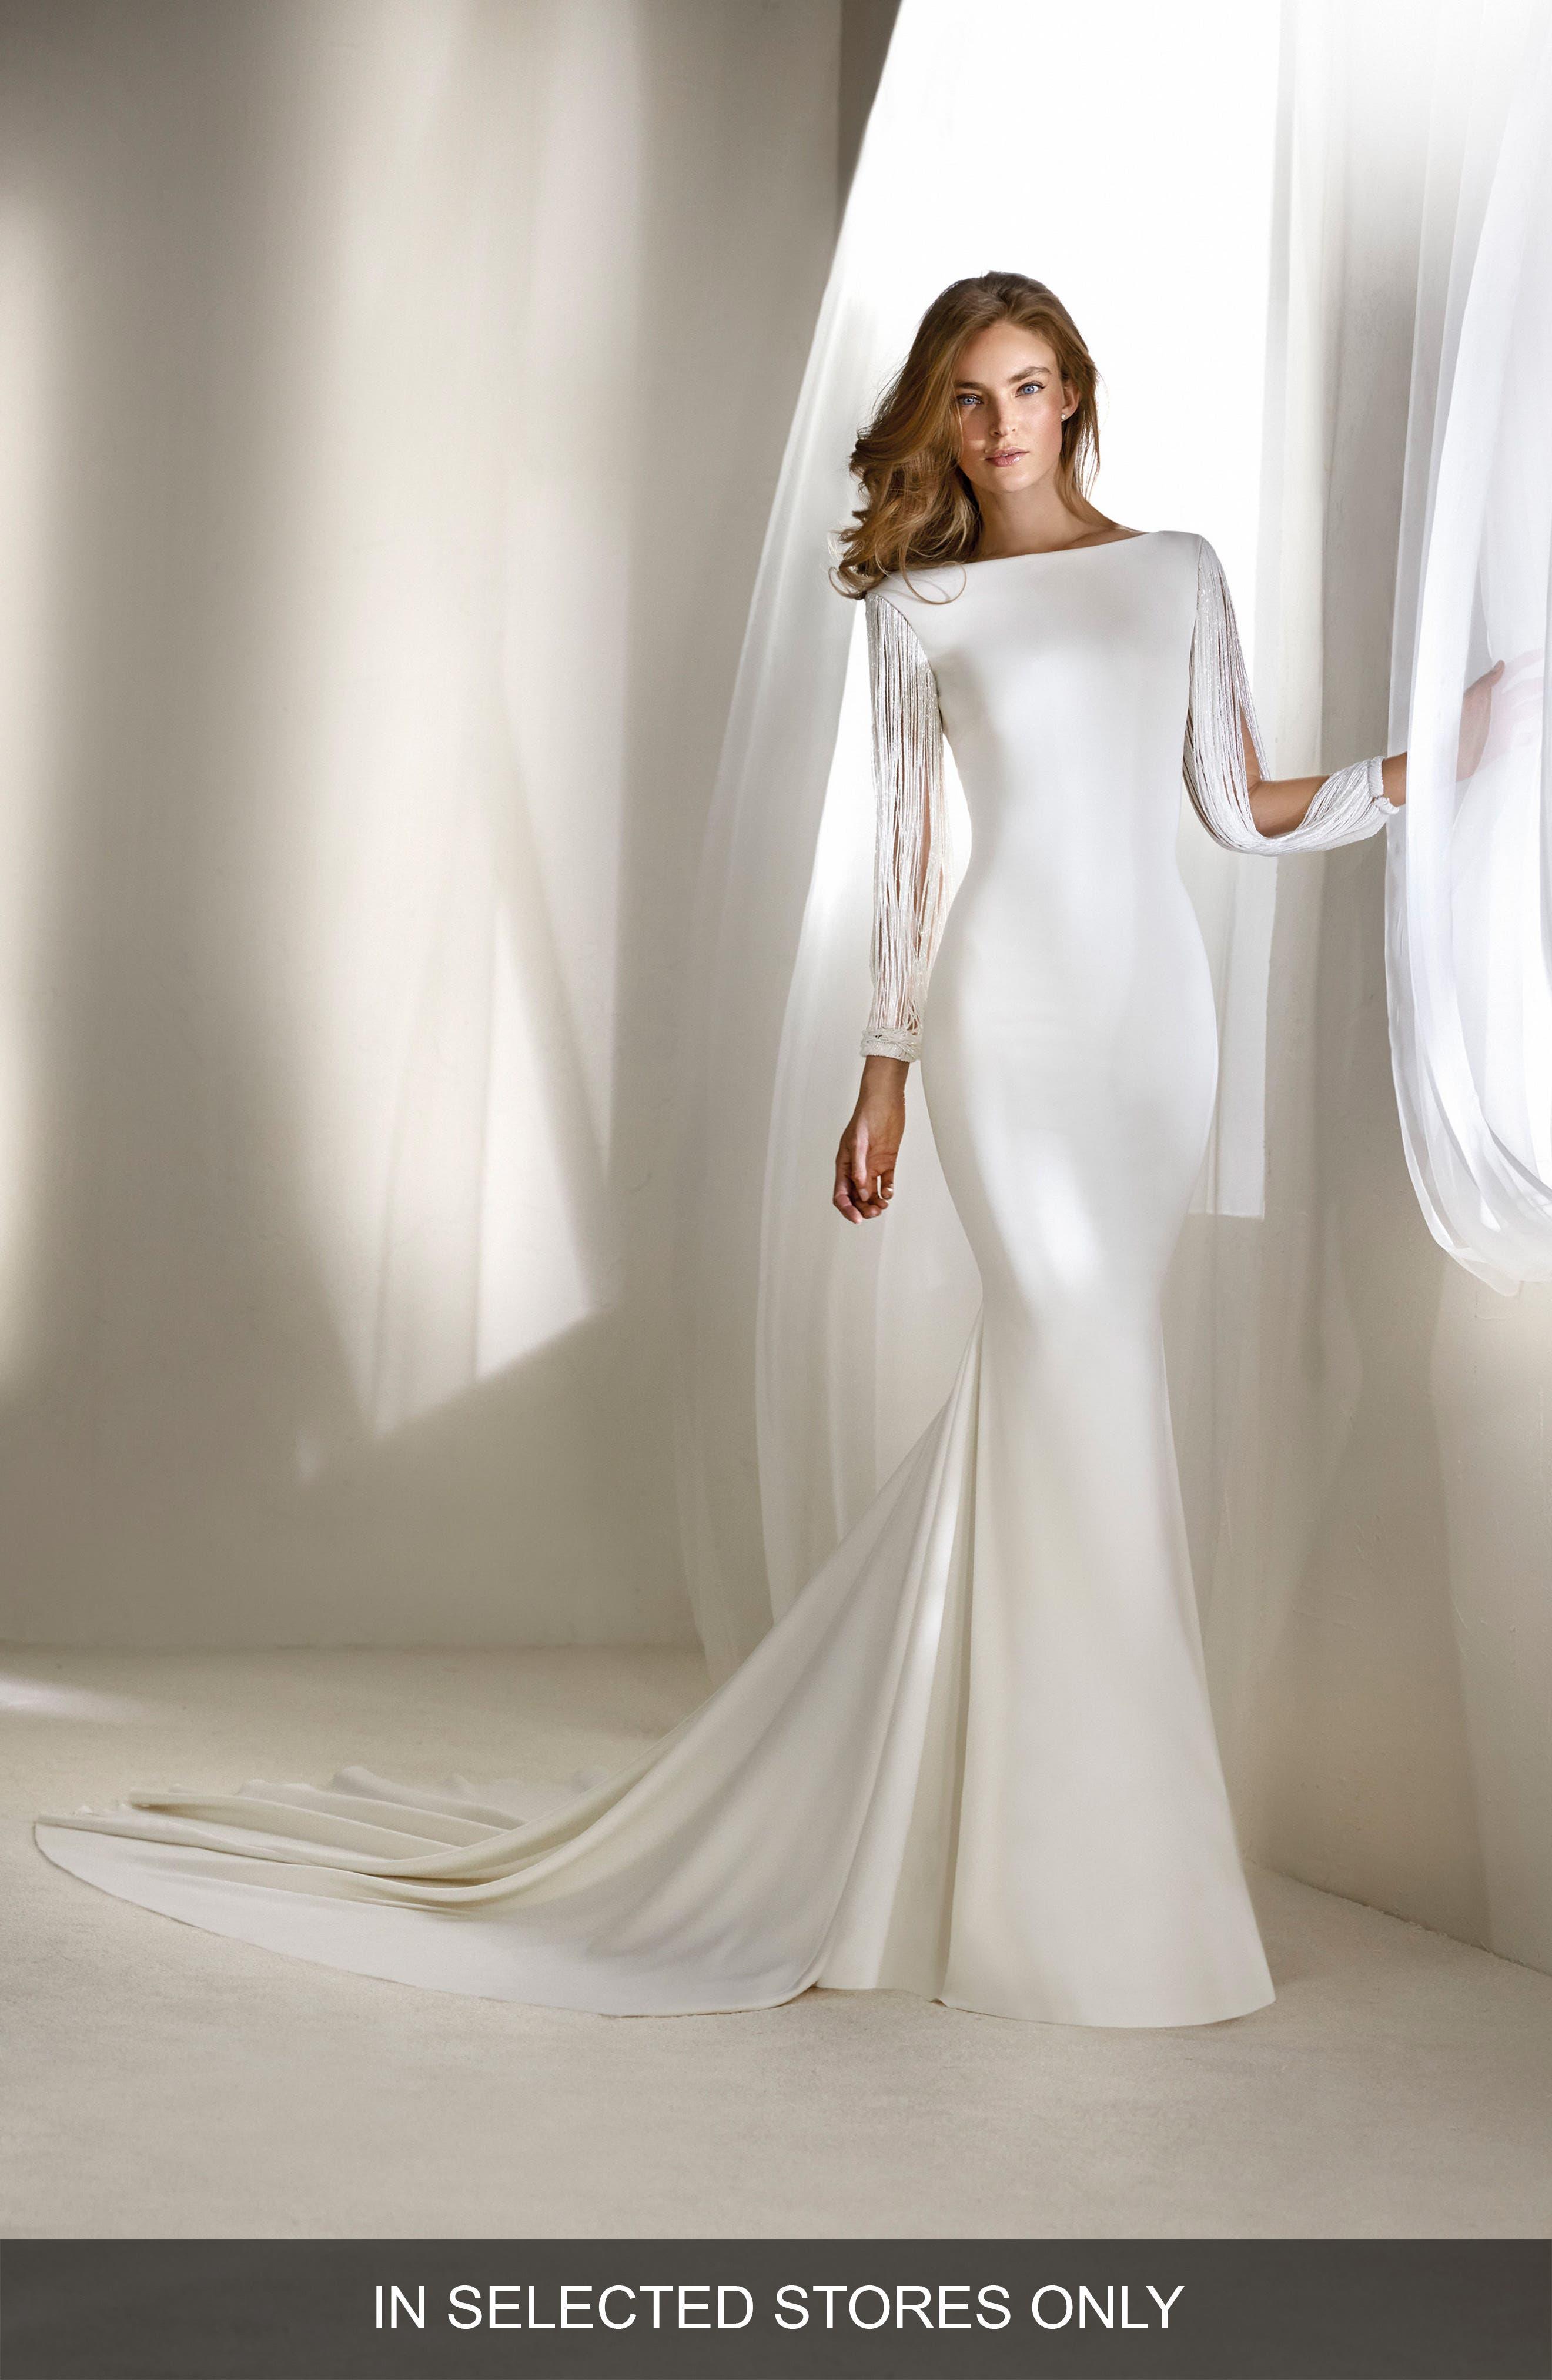 long sleeve mermaid wedding dress. atelier pronovias relato beaded long sleeve mermaid gown wedding dress